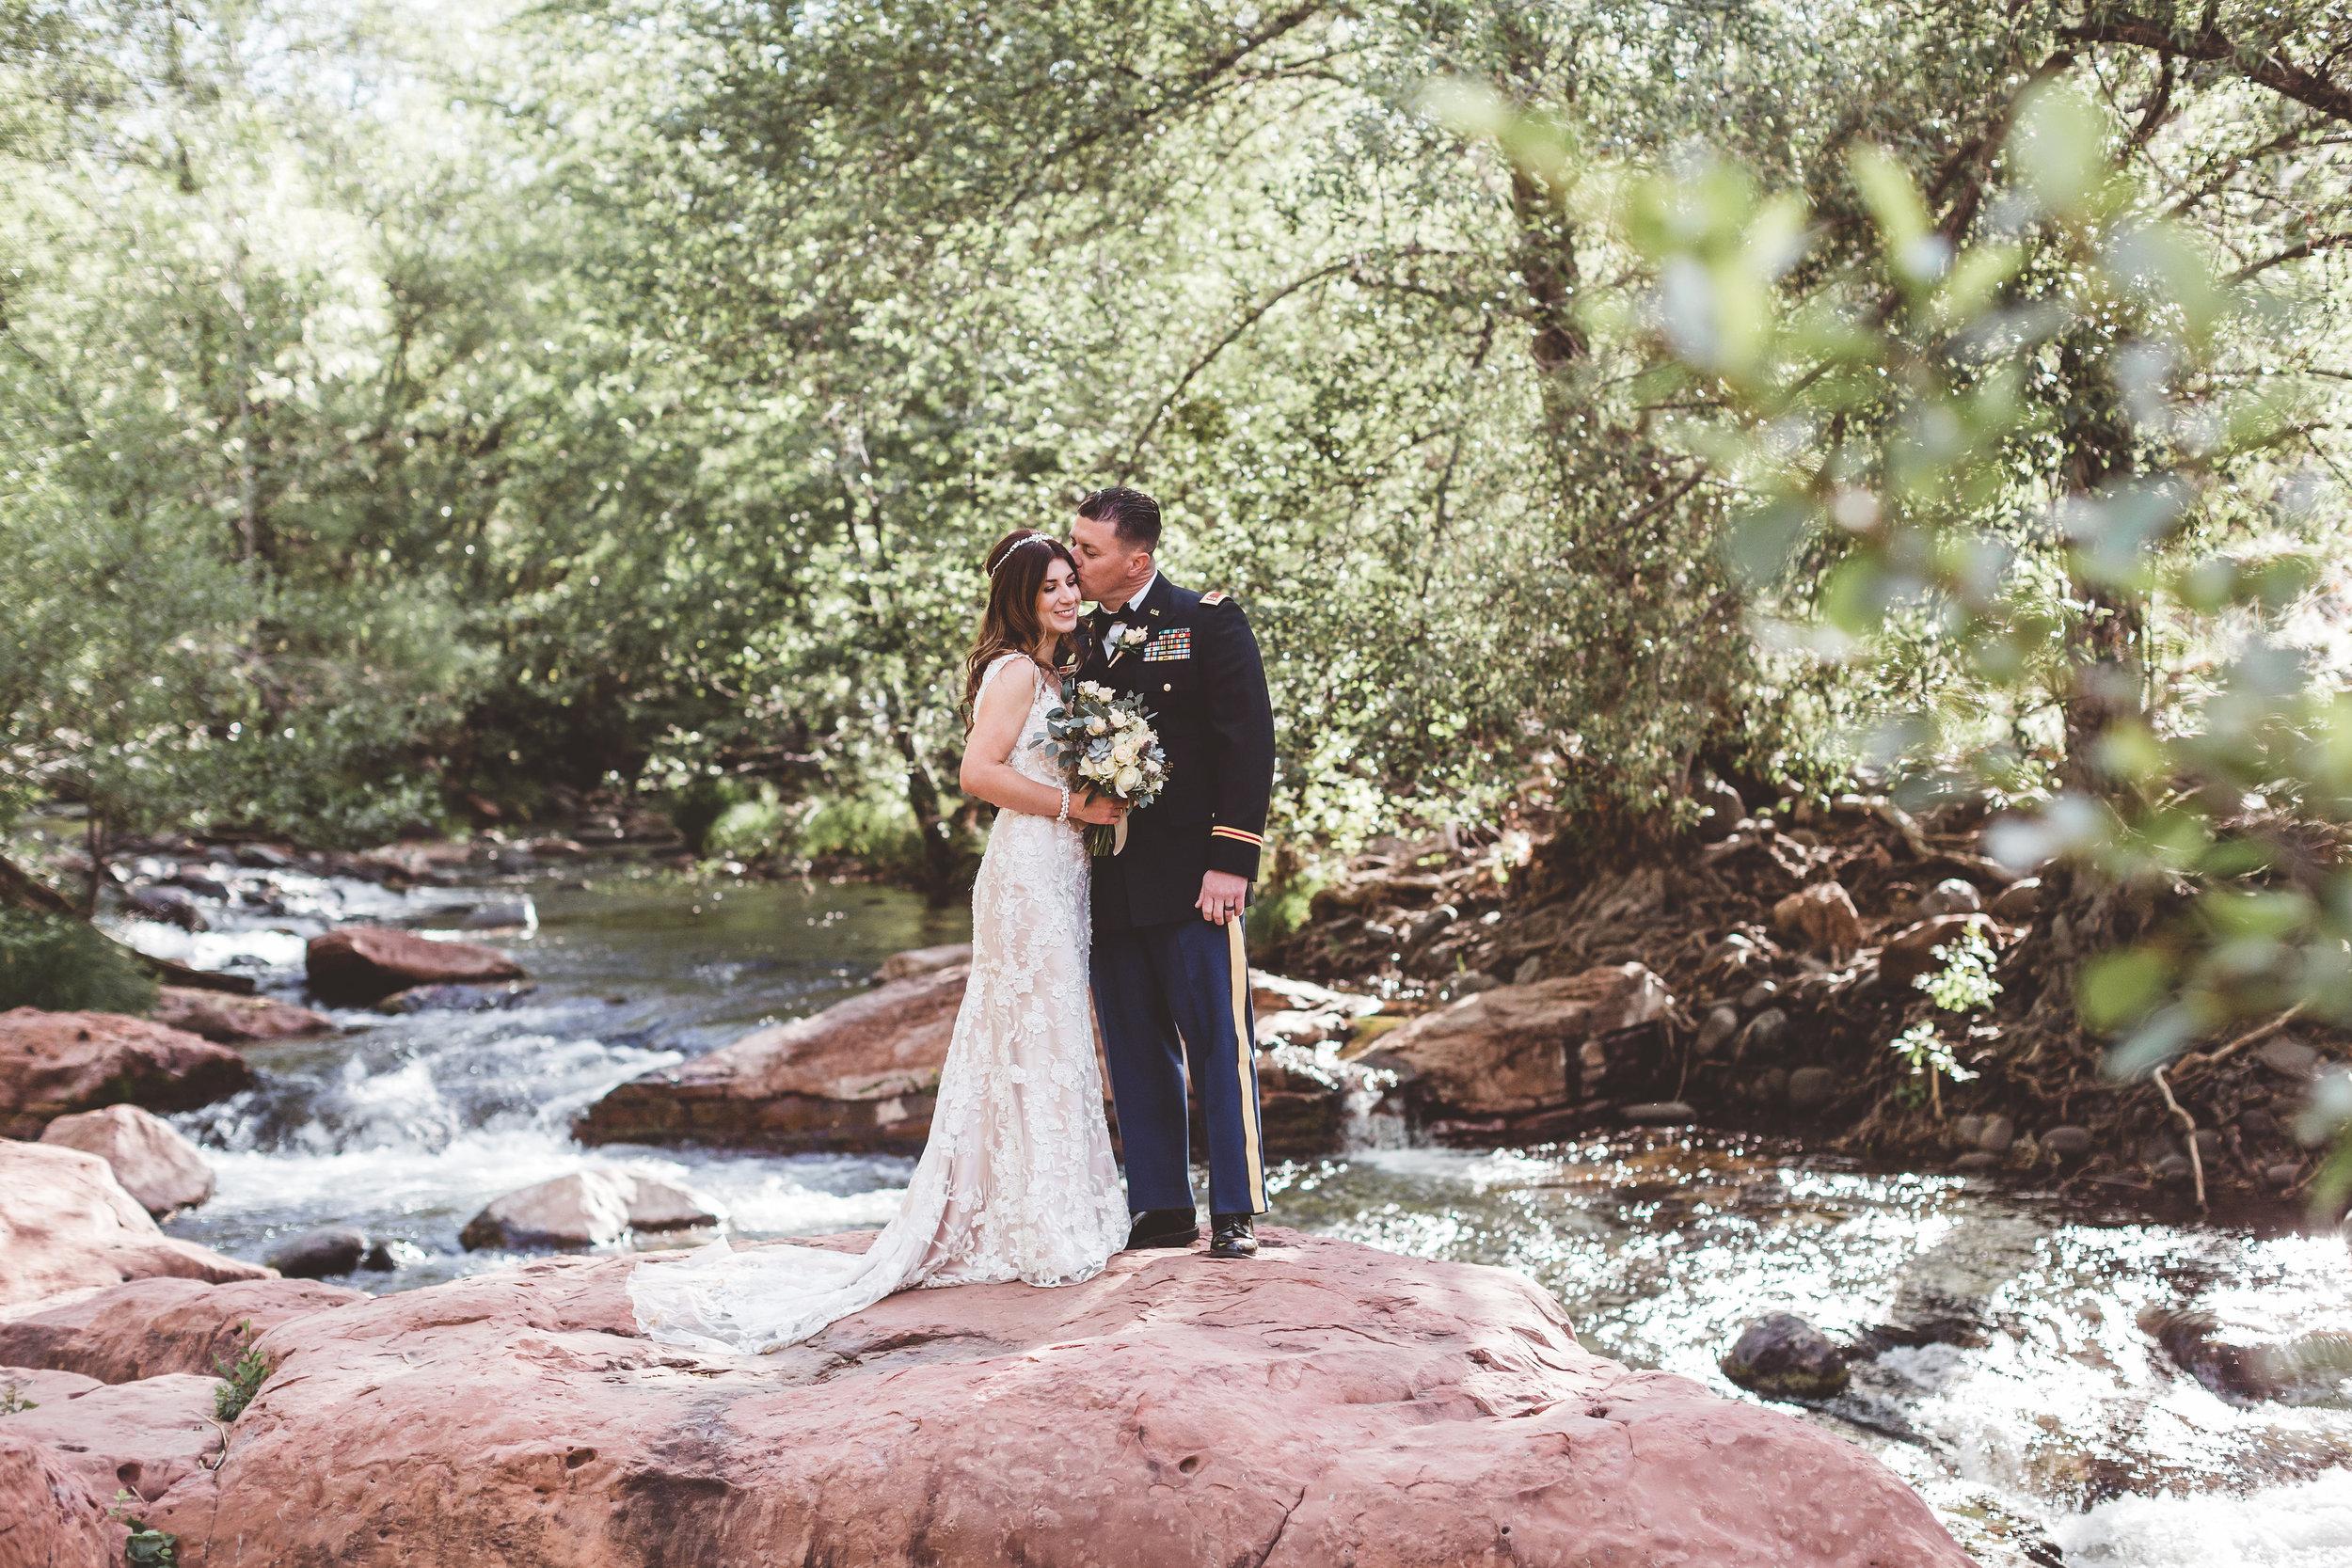 jenna-and-erics-romantic-sedona-wedding27.jpg